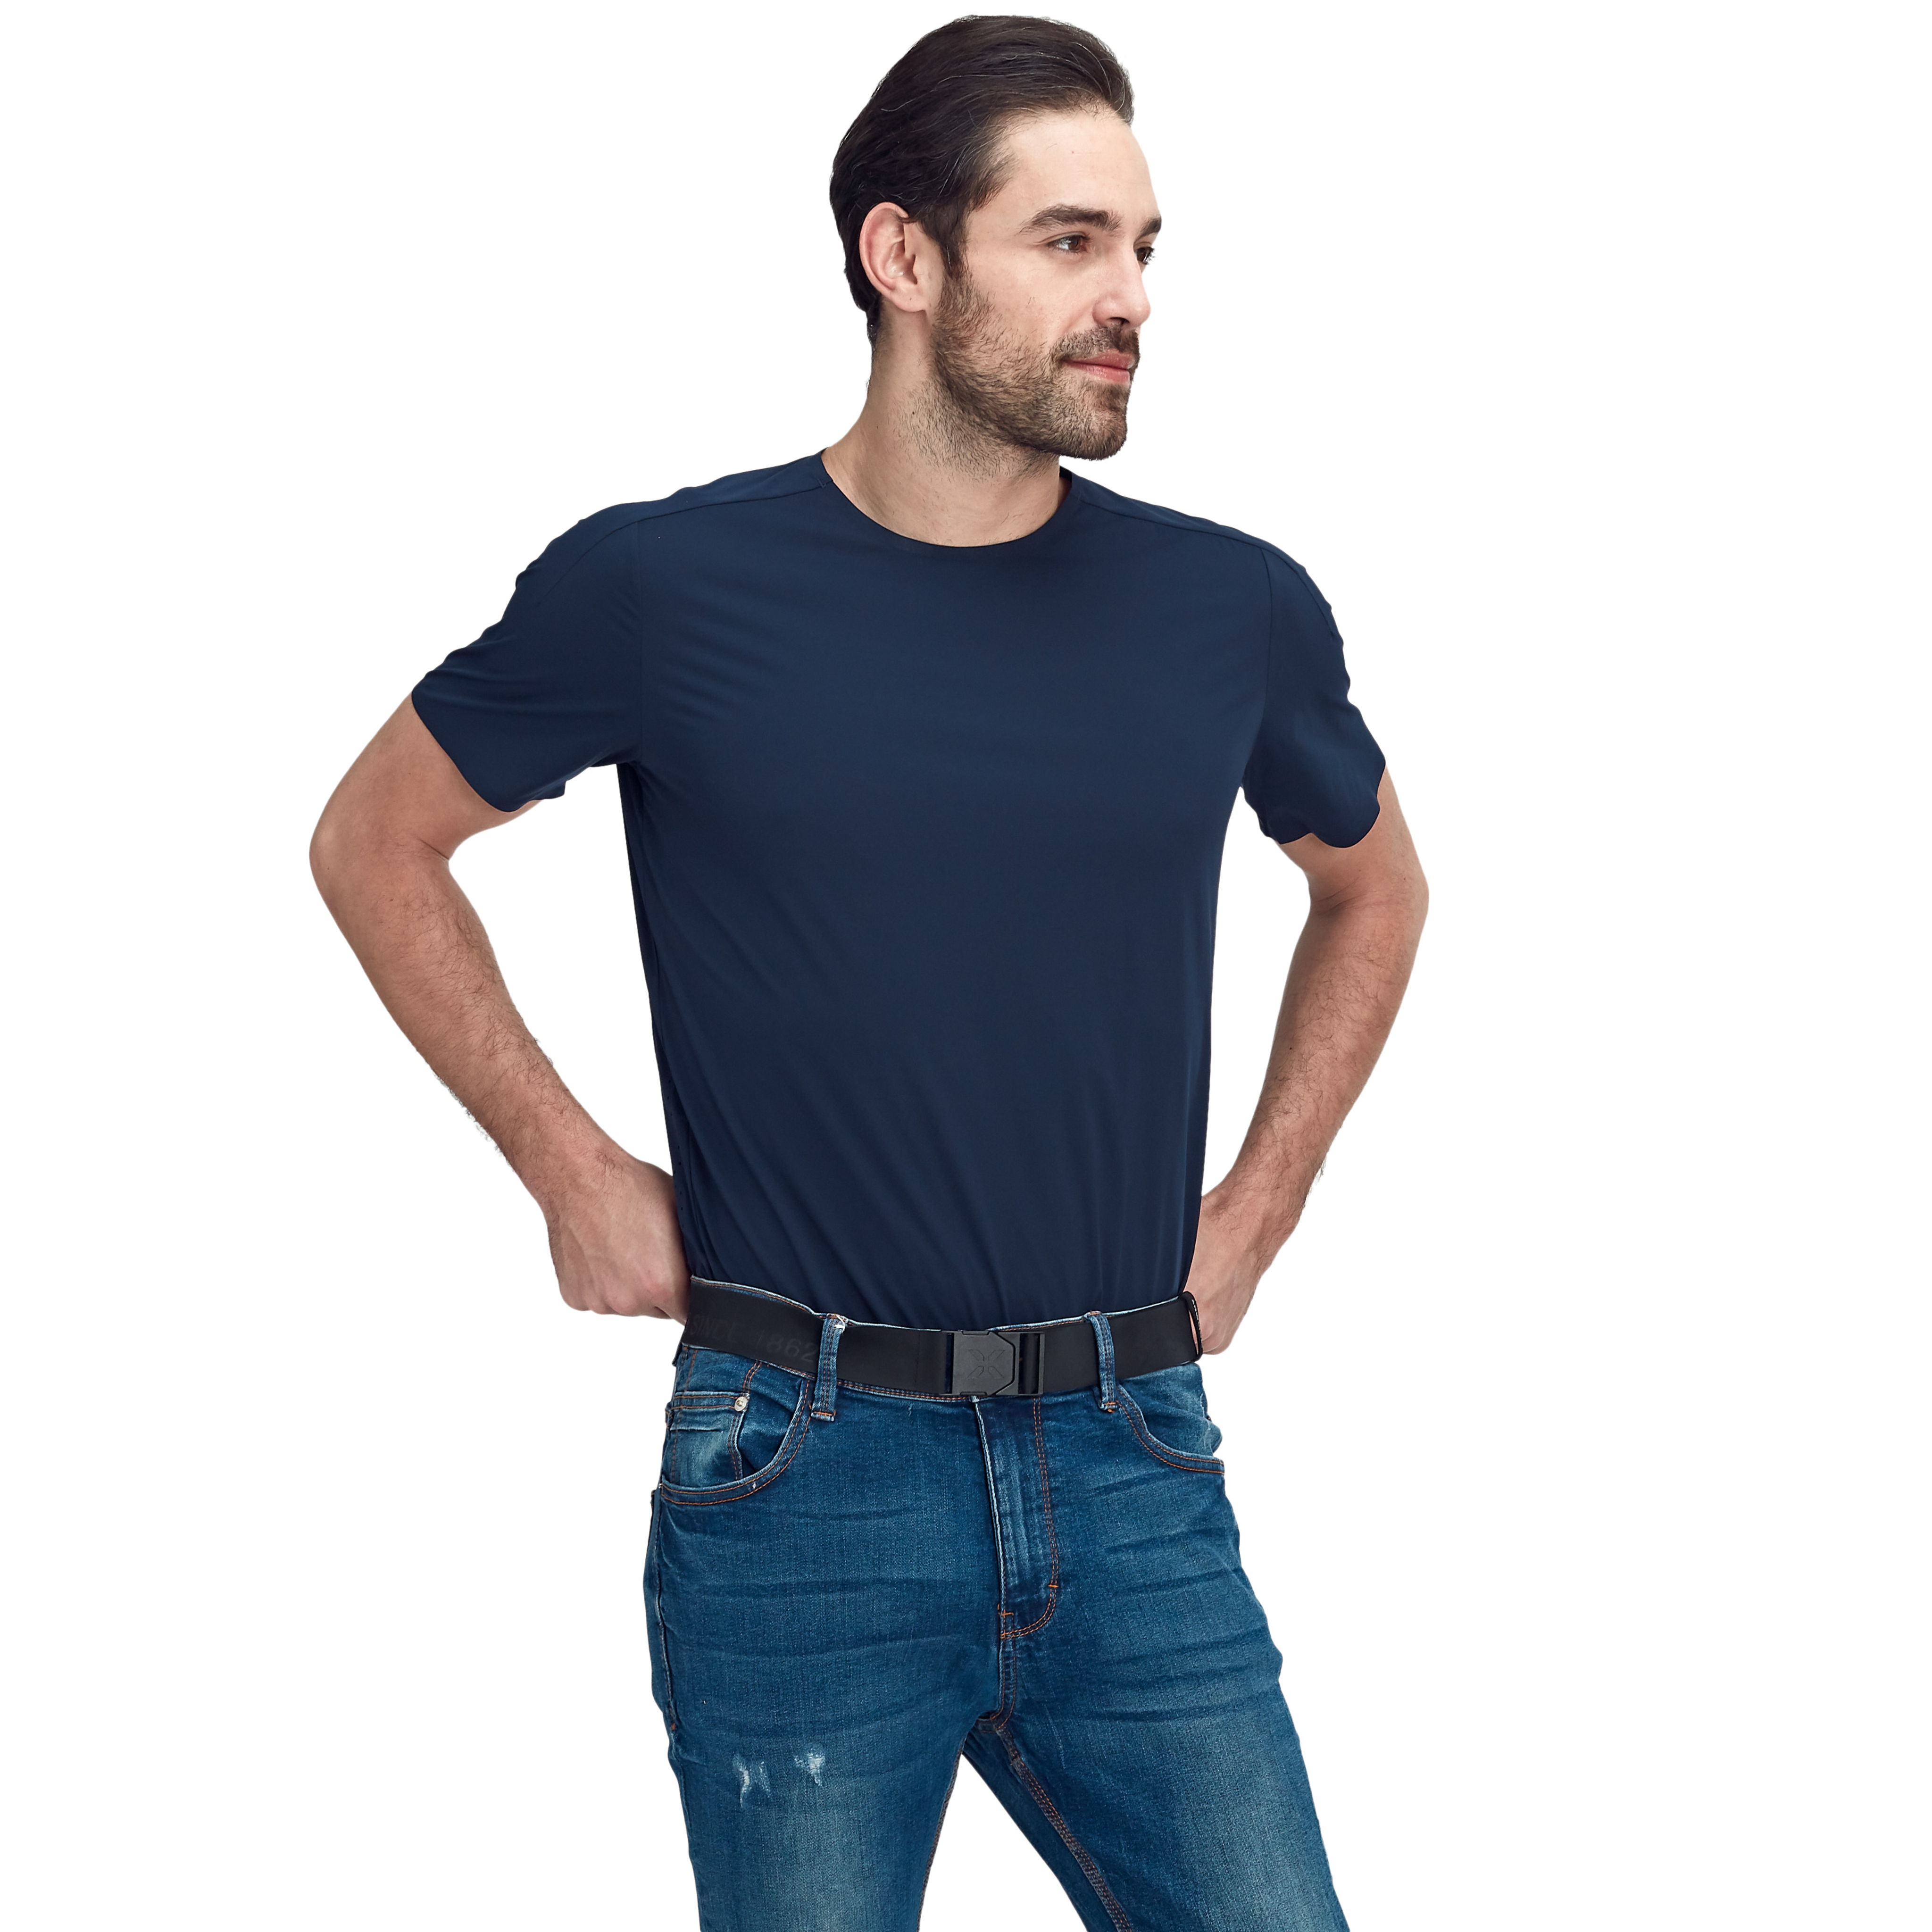 THE Belt product image